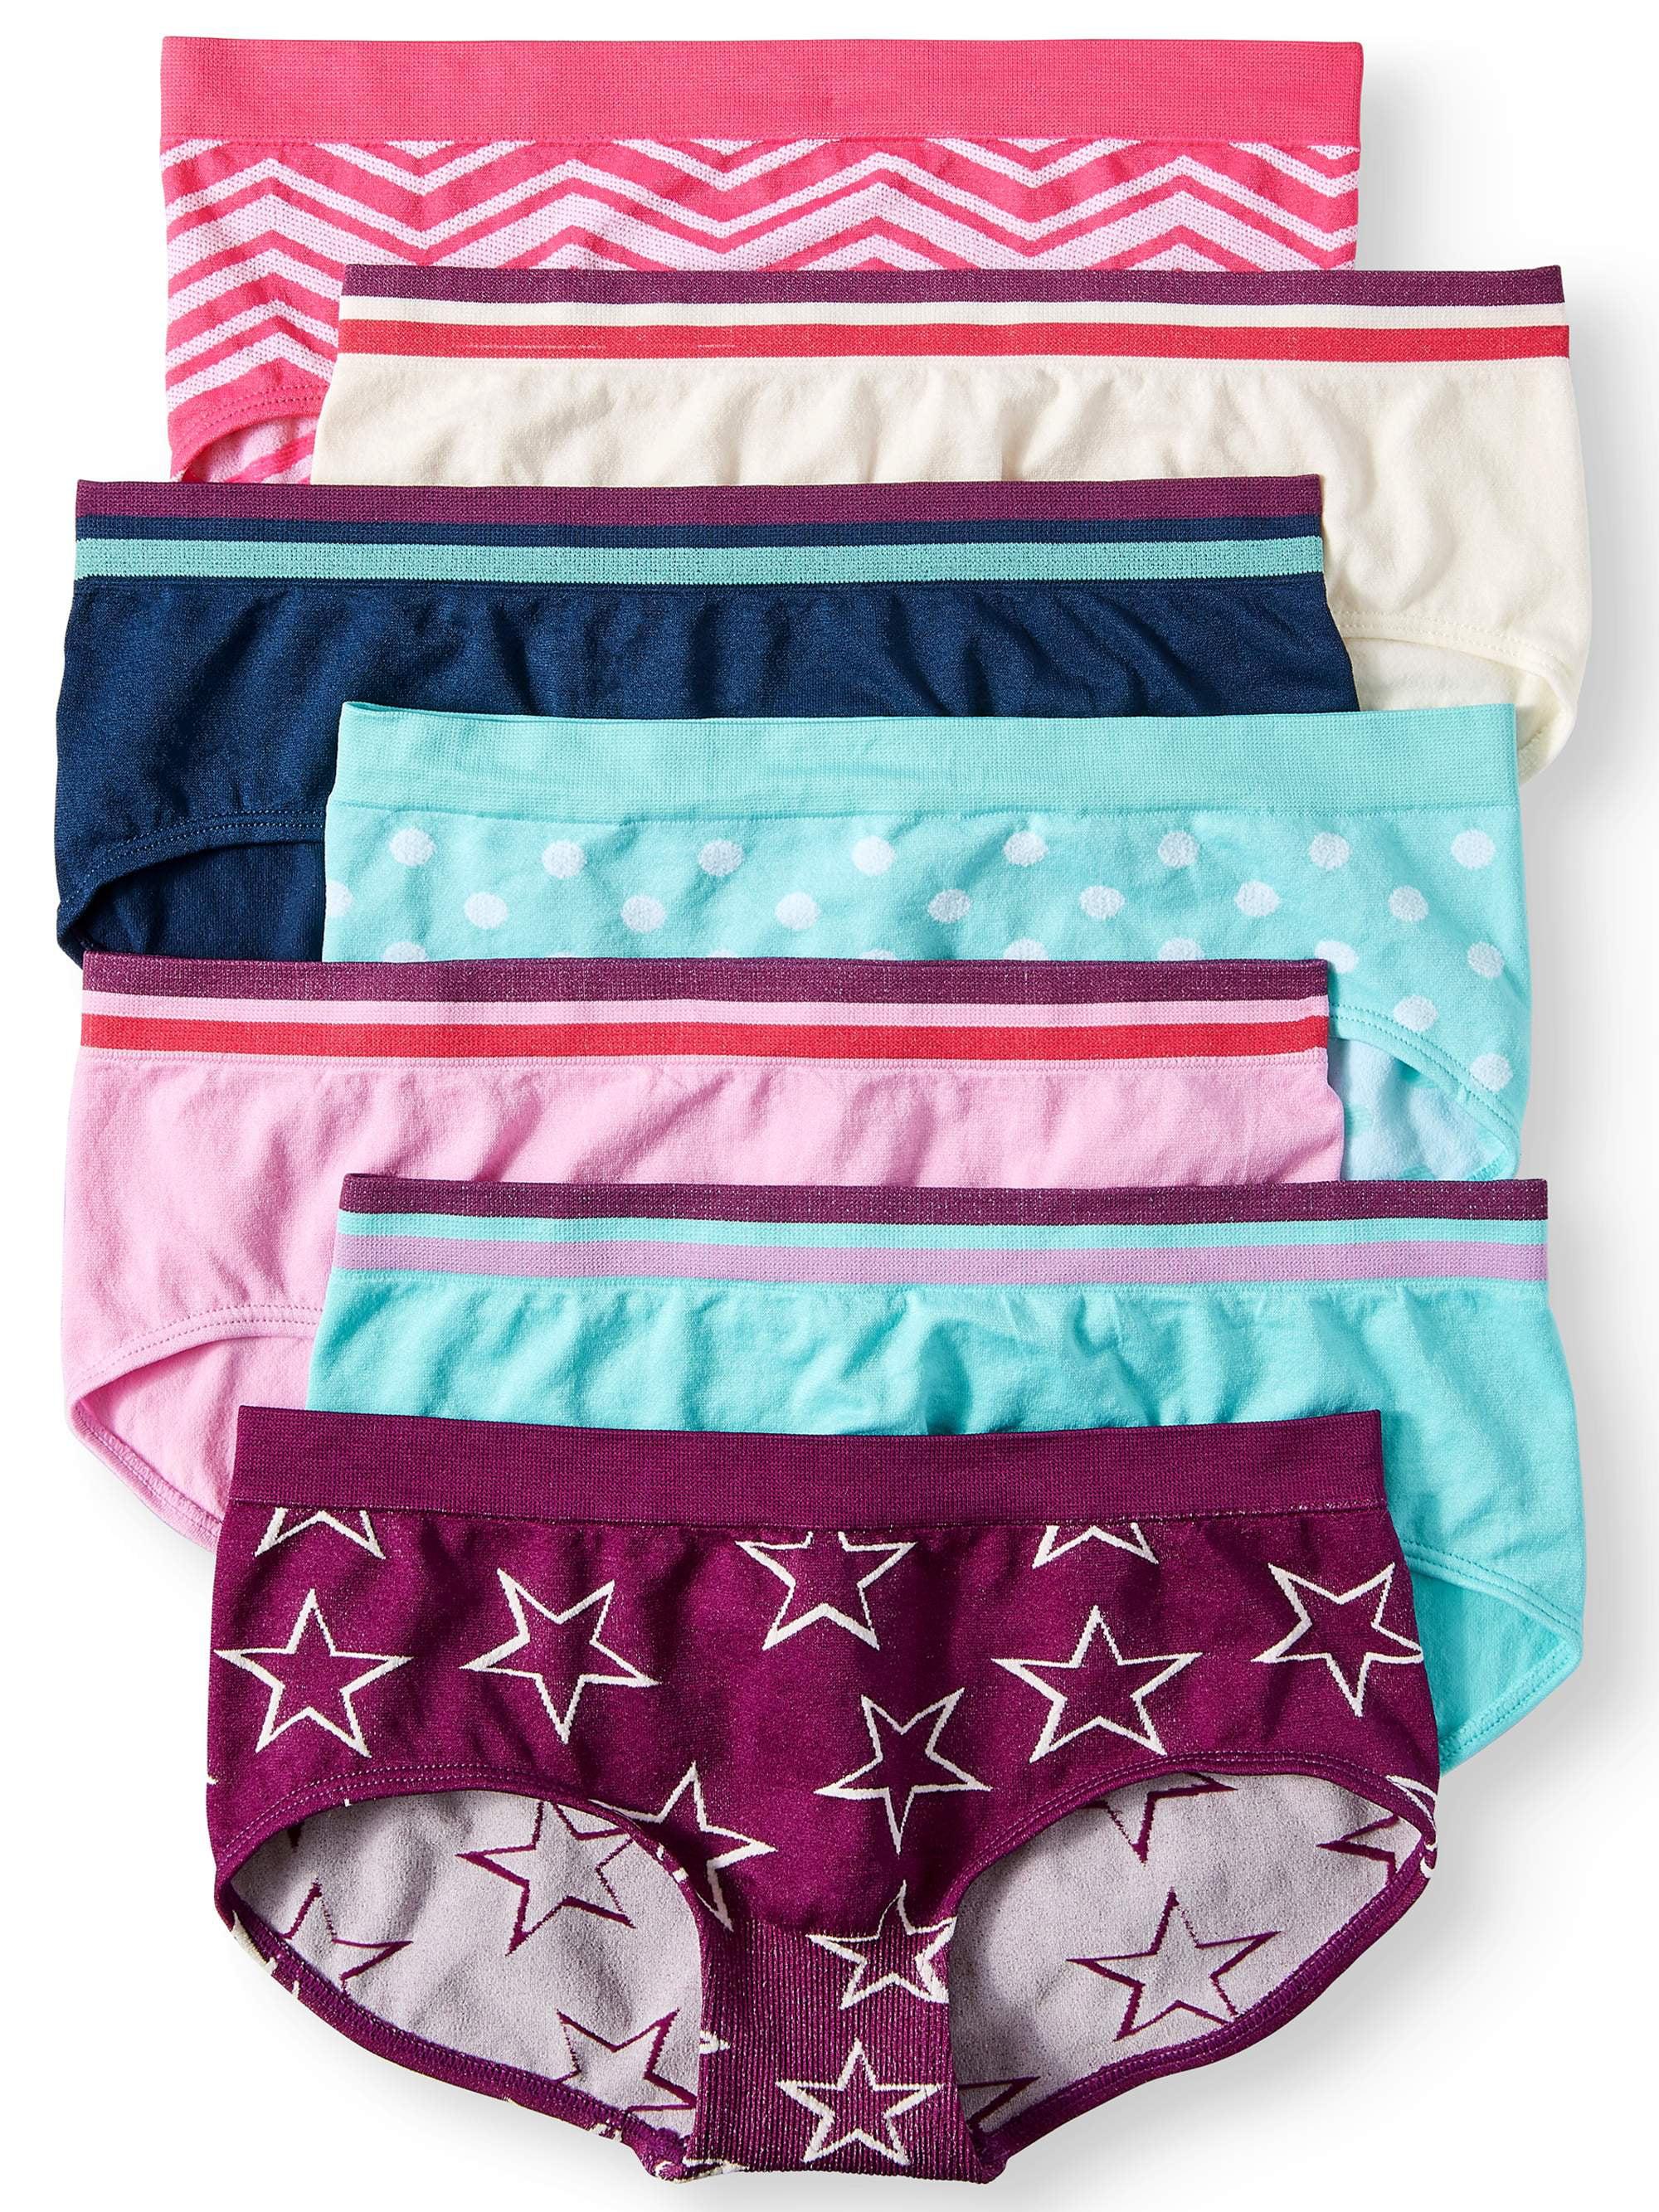 c88a7bdada9 Wonder Nation Girls Seamless Boyshort Panty